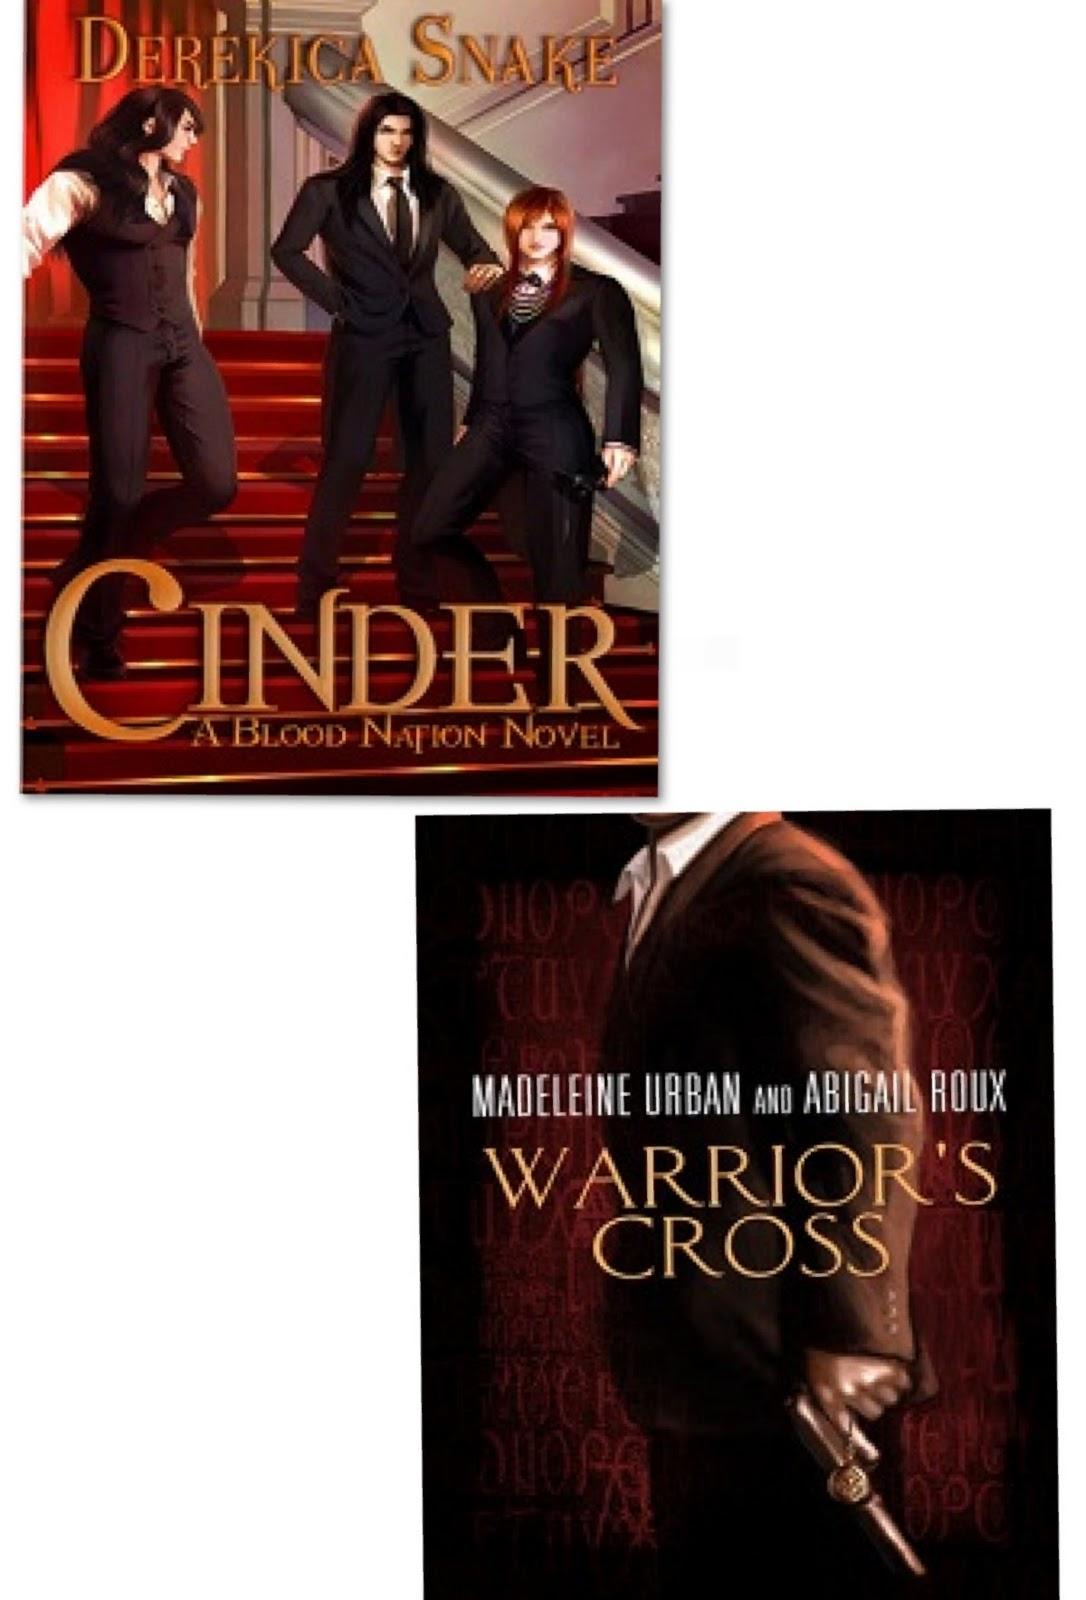 Warrior's Cross full book, Warrior's Cross ebook, download Warrior's Cross  for android, Warrior's Cross ipad iphone android, Warrior's Cross gratis,  ...